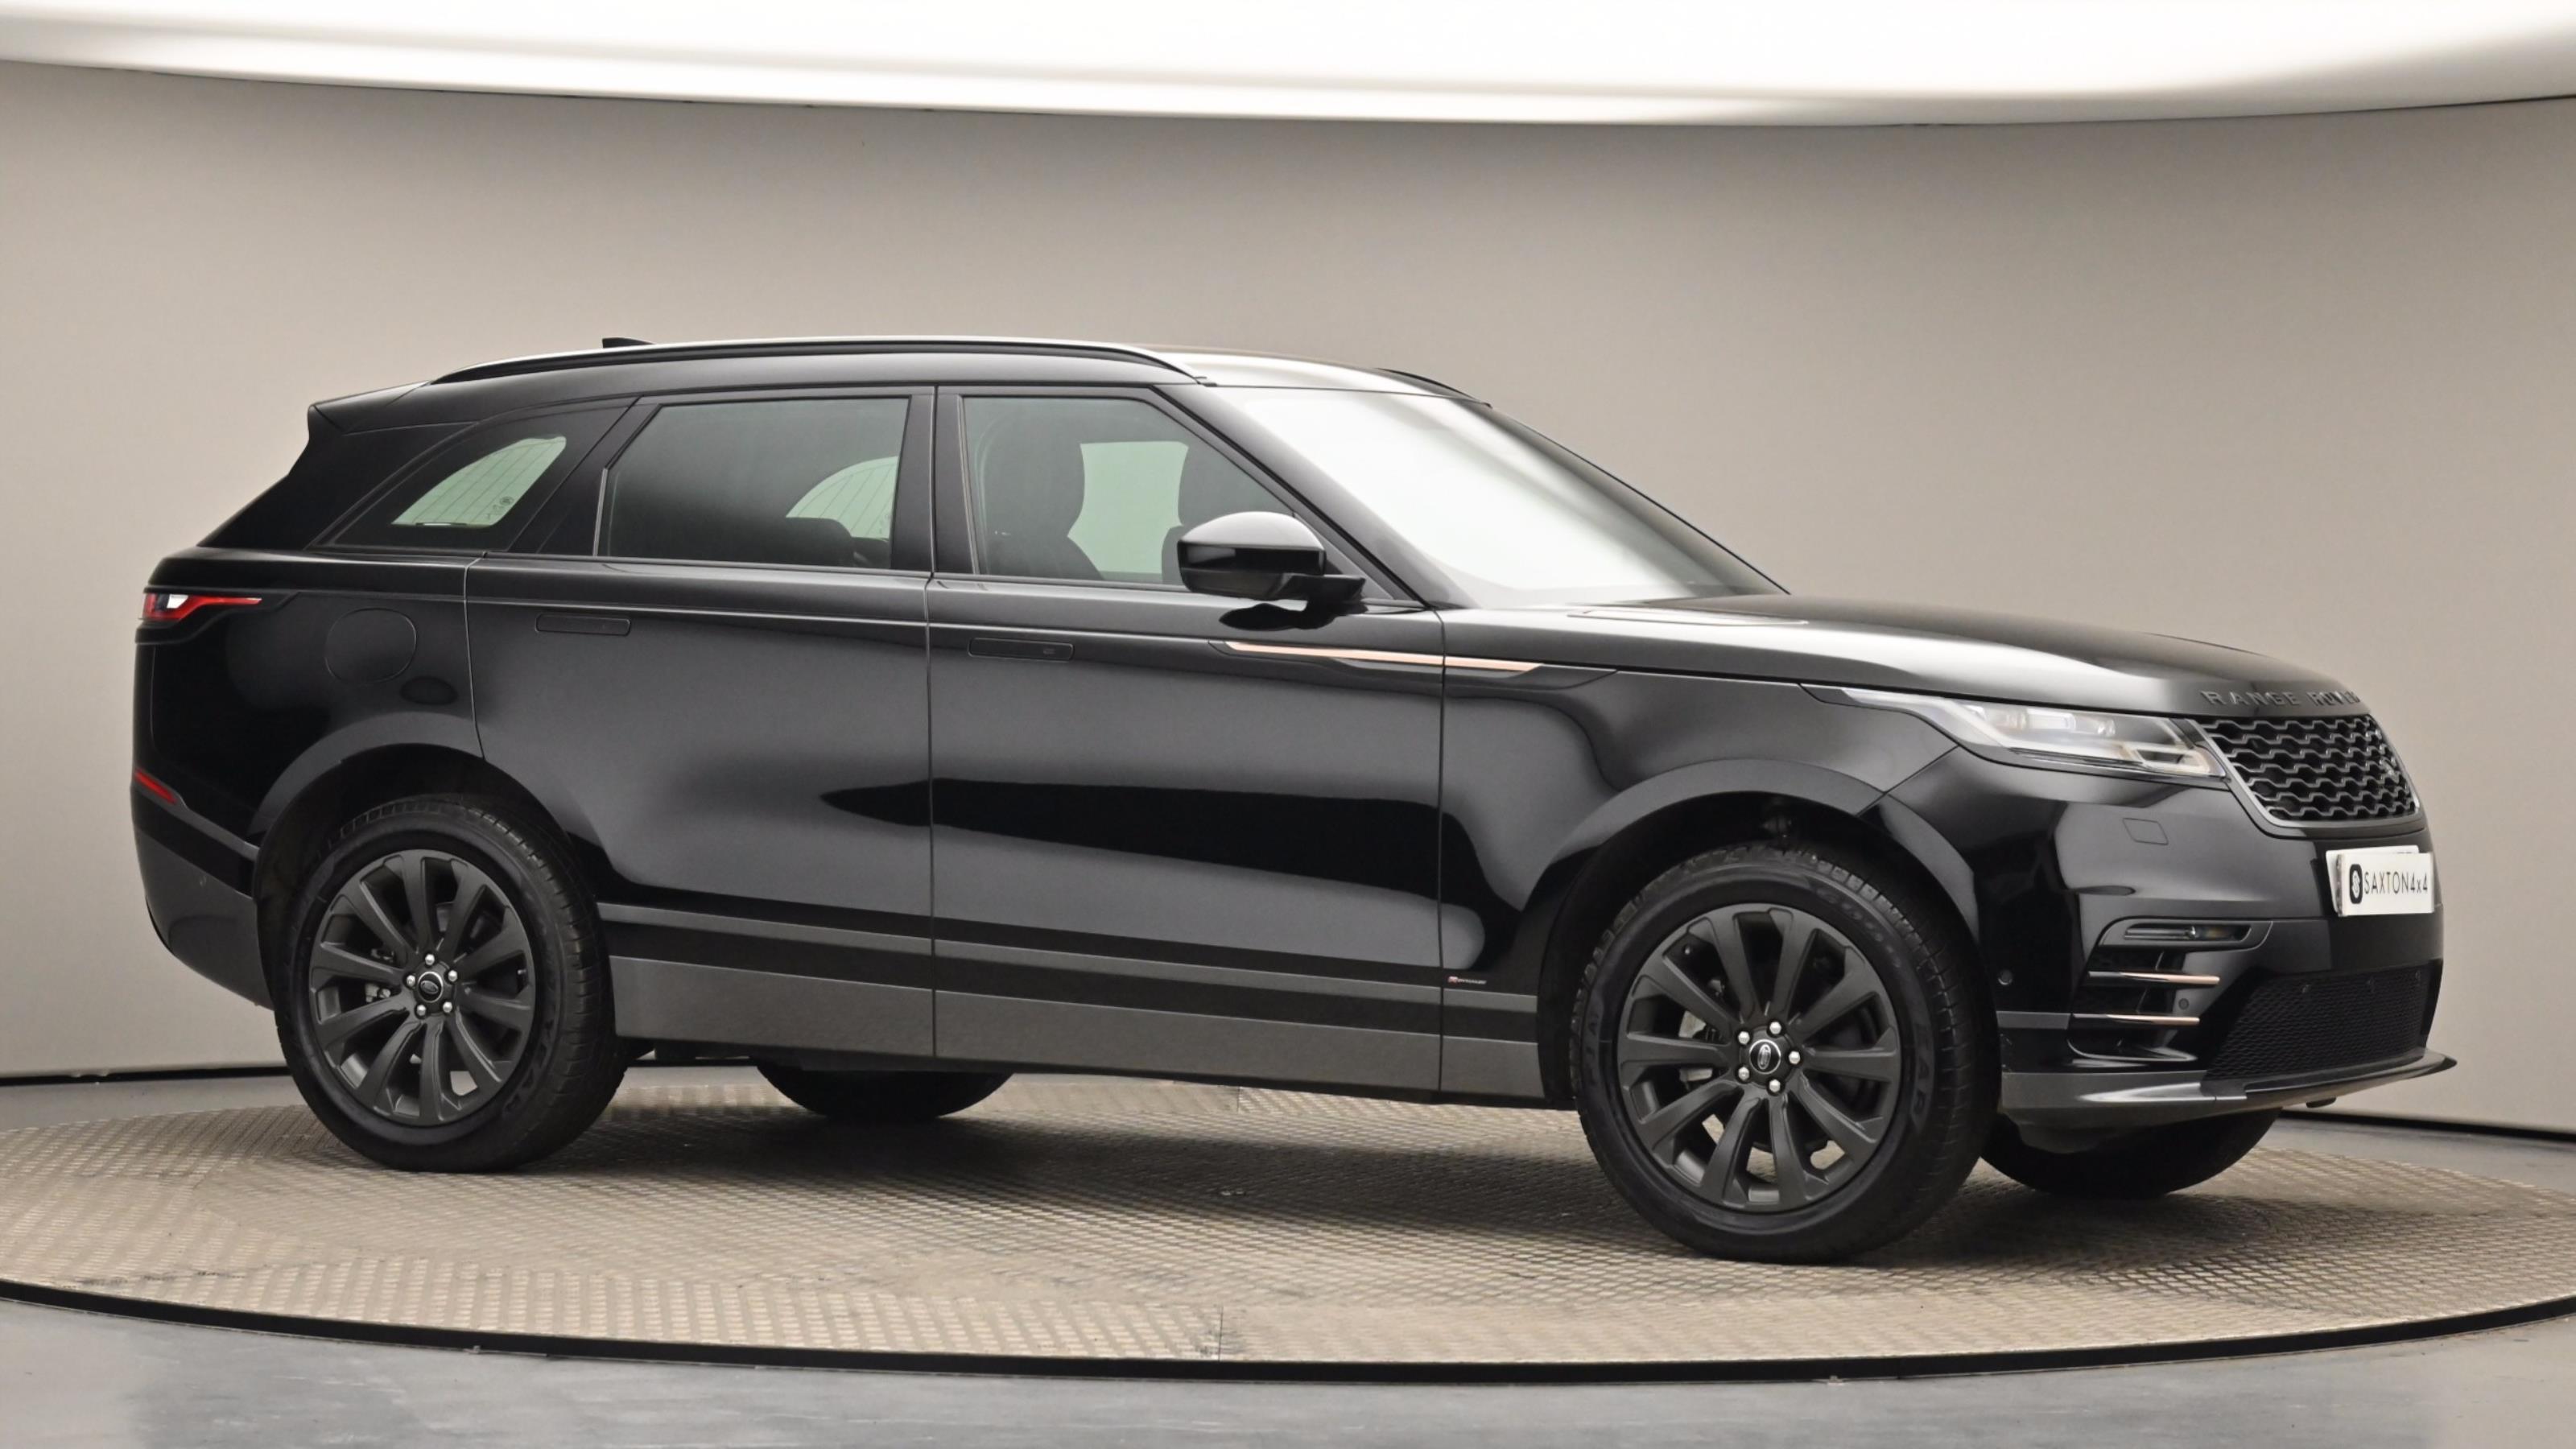 Used 2018 Land Rover RANGE ROVER VELAR 2.0 P250 R-Dynamic SE 5dr Auto at Saxton4x4